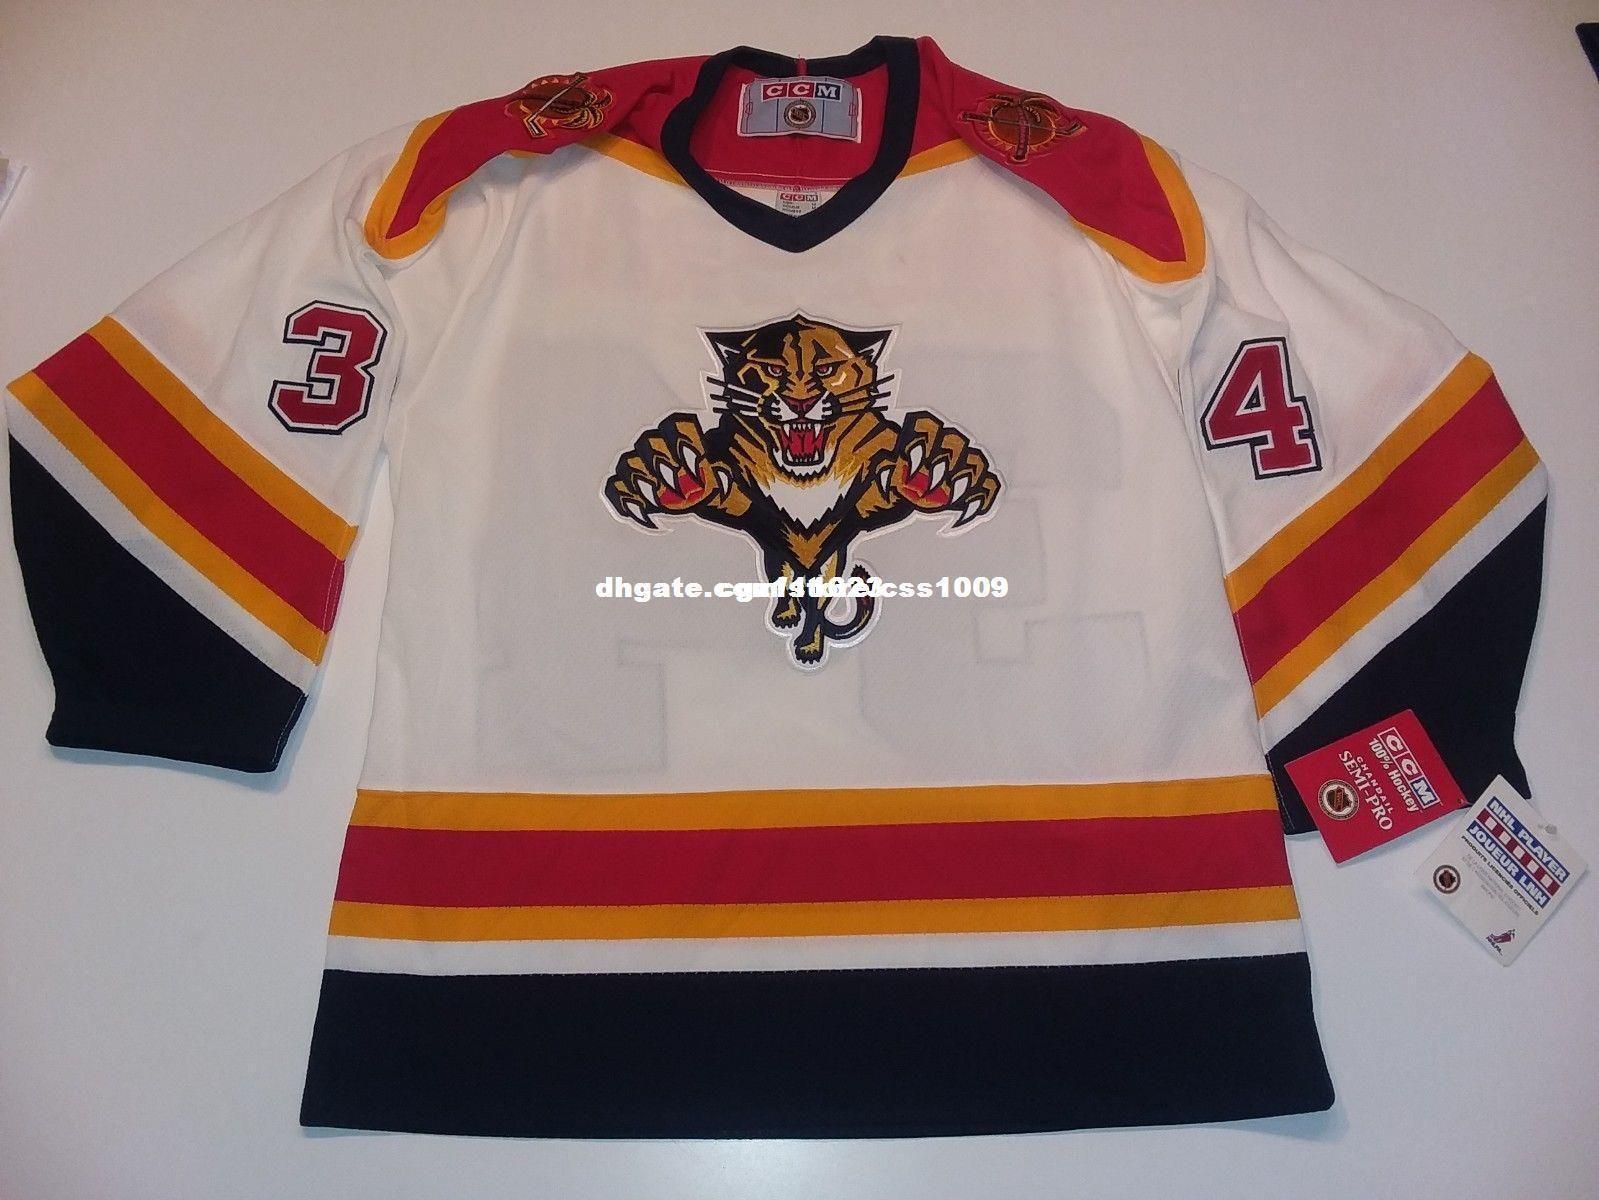 612f9fcd2 2019 Cheap Custom Florida Panthers Nwt Rare Vanbiesbrouck CCM HOCKEY JERSEY  Personalized Customization Men S Retro Ice Hockey Jersey From Hysjersey